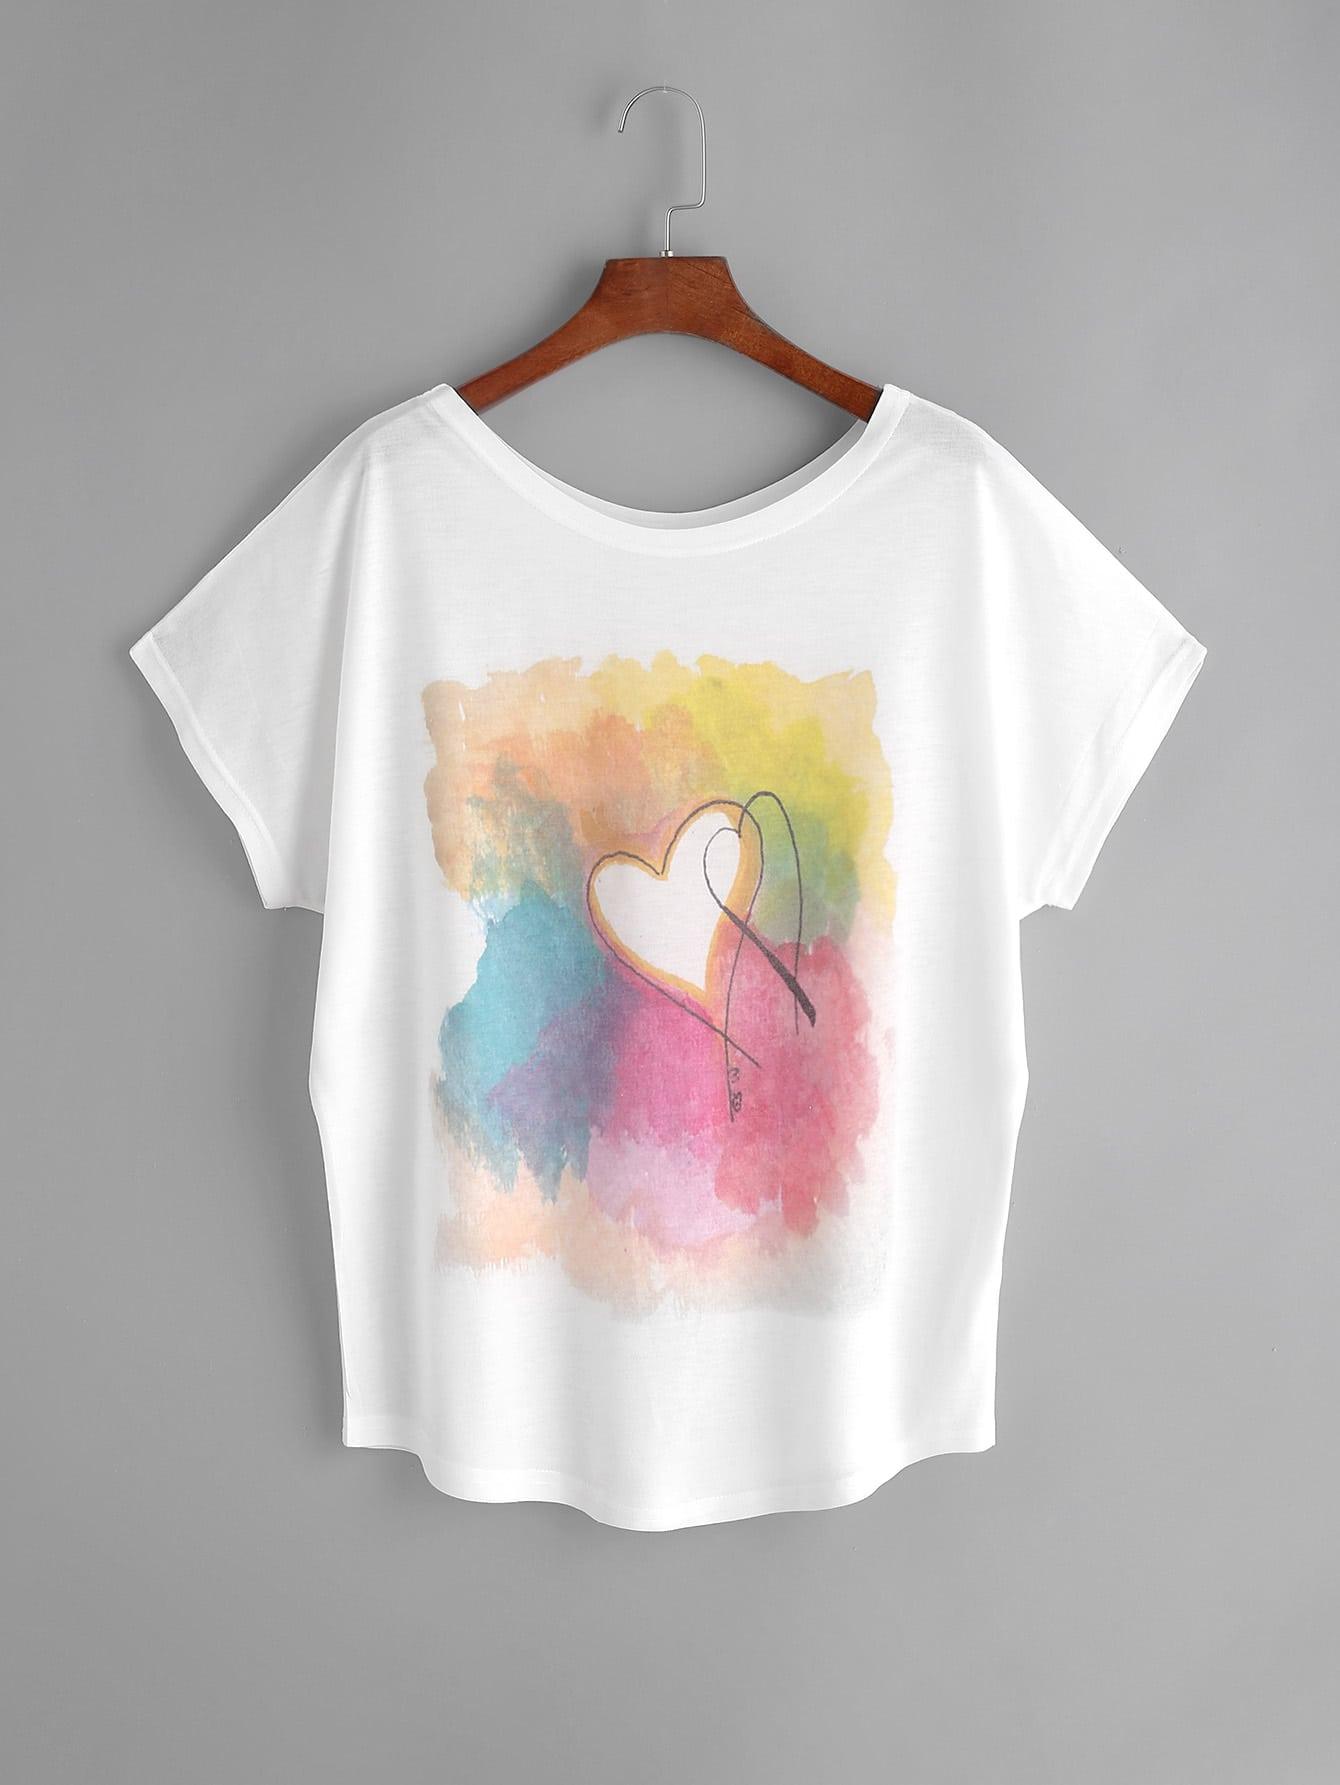 Acrylic Paint On Polyester Shirt